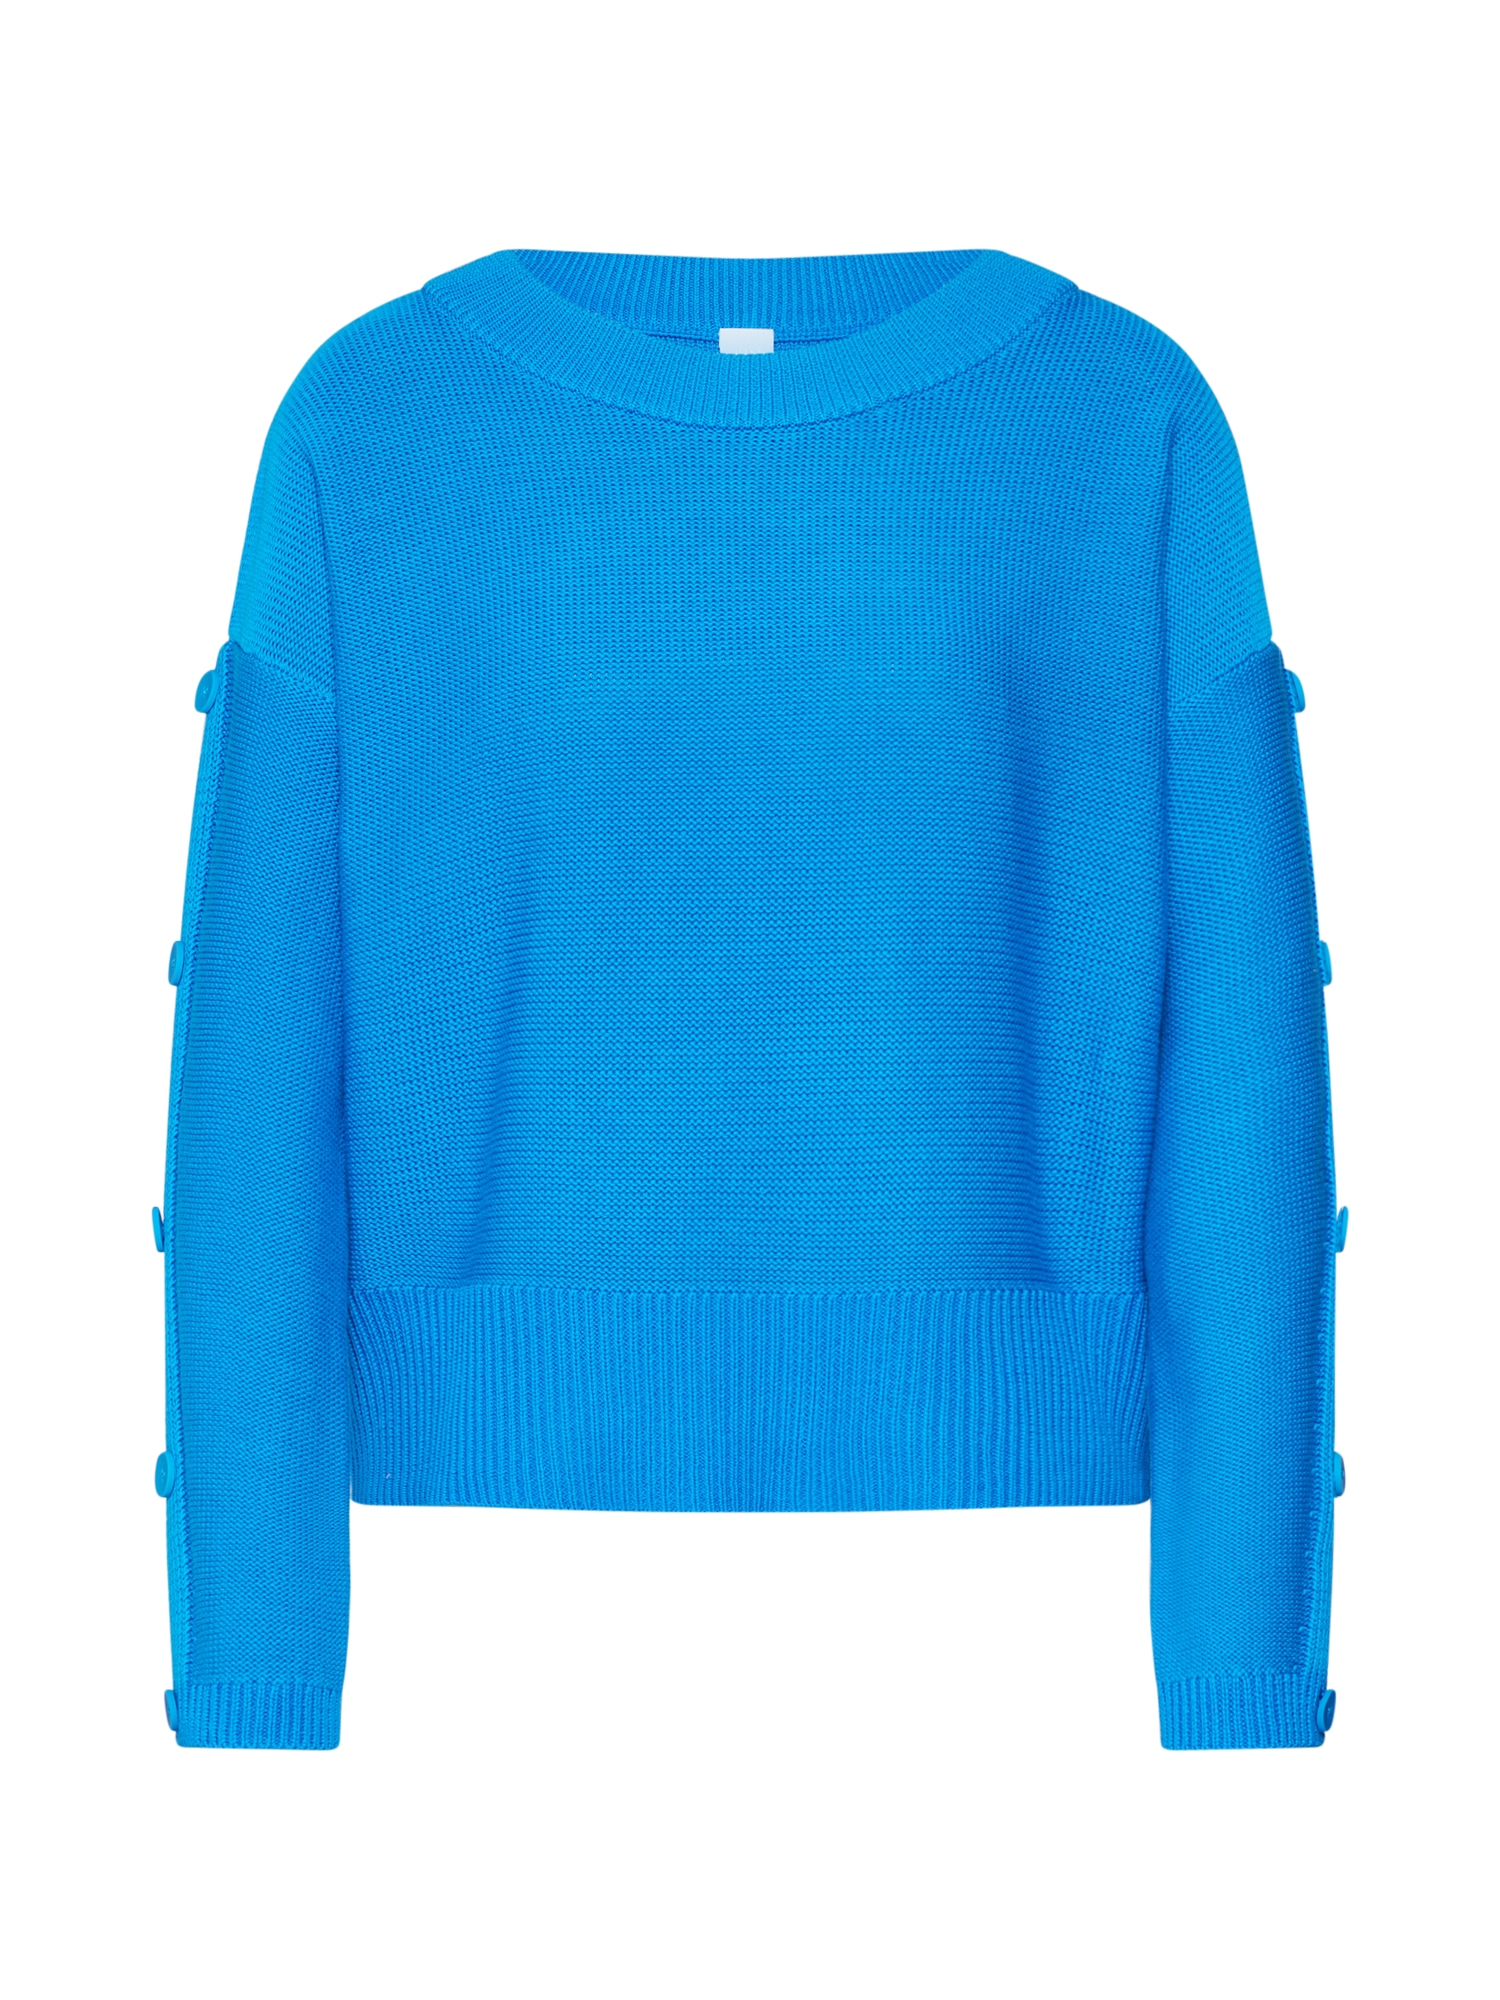 BOSS Megztinis 'Wendelin' mėlyna